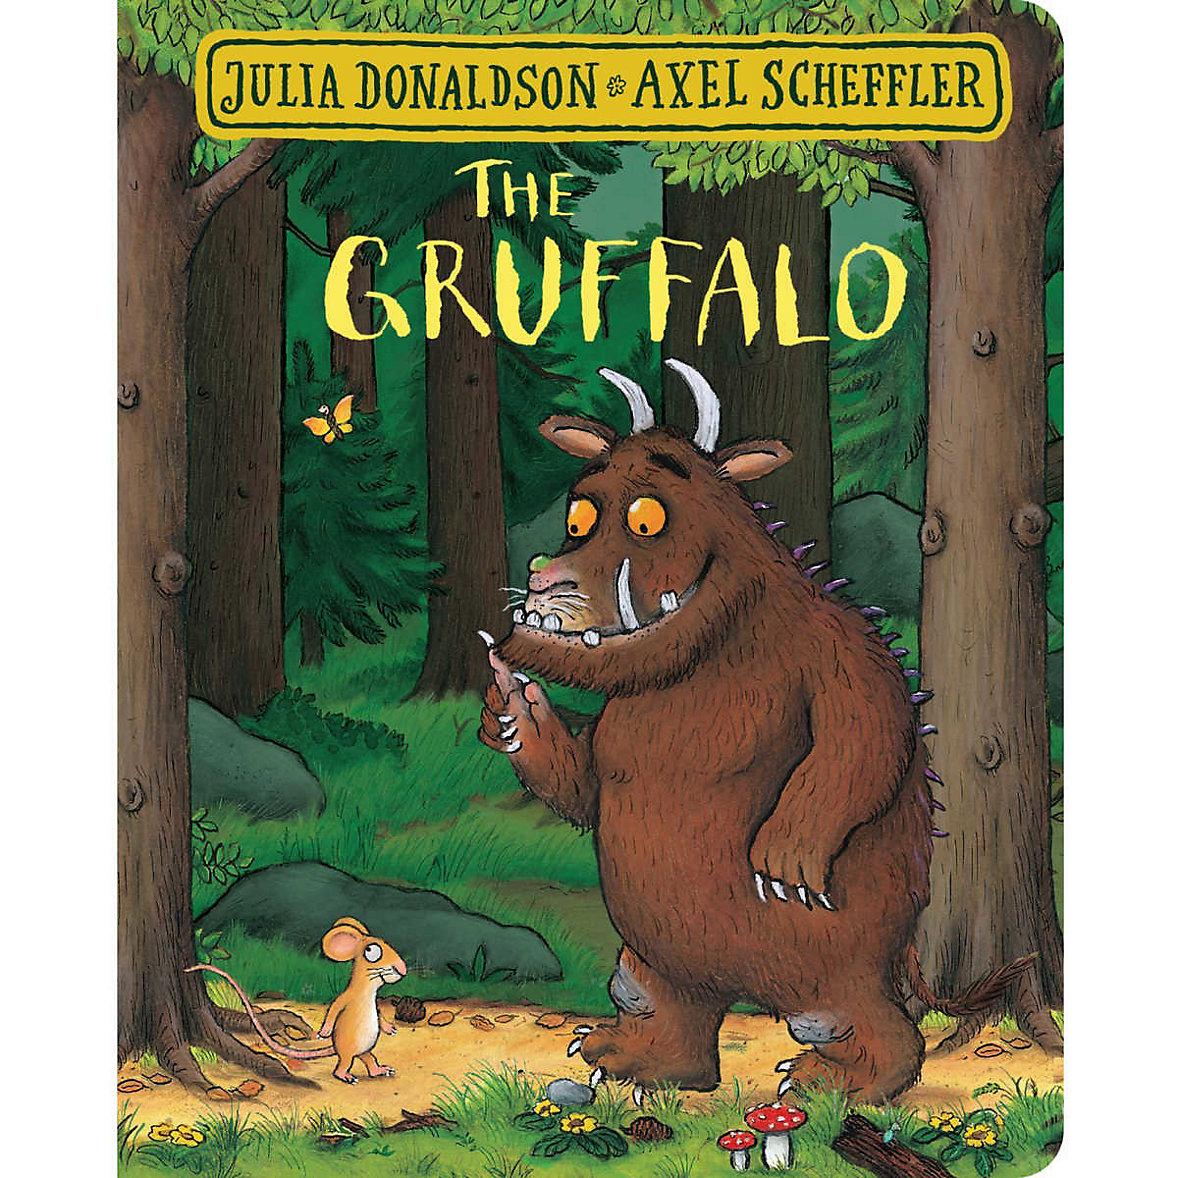 The Gruffalo - Julia Donaldson & Axel Scheffler